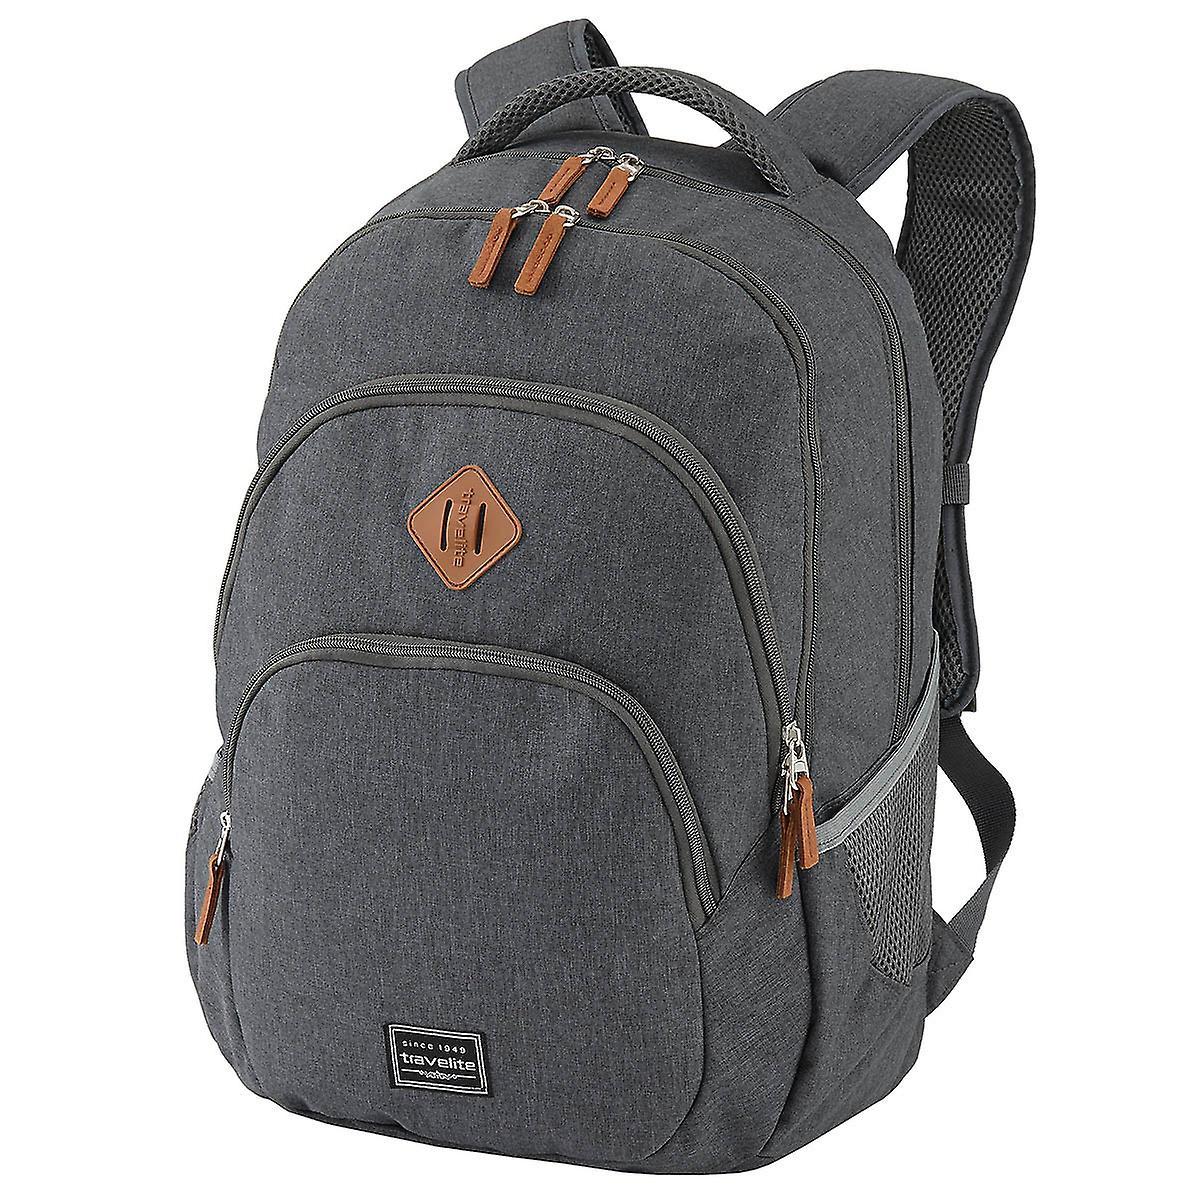 rygsæk til skole